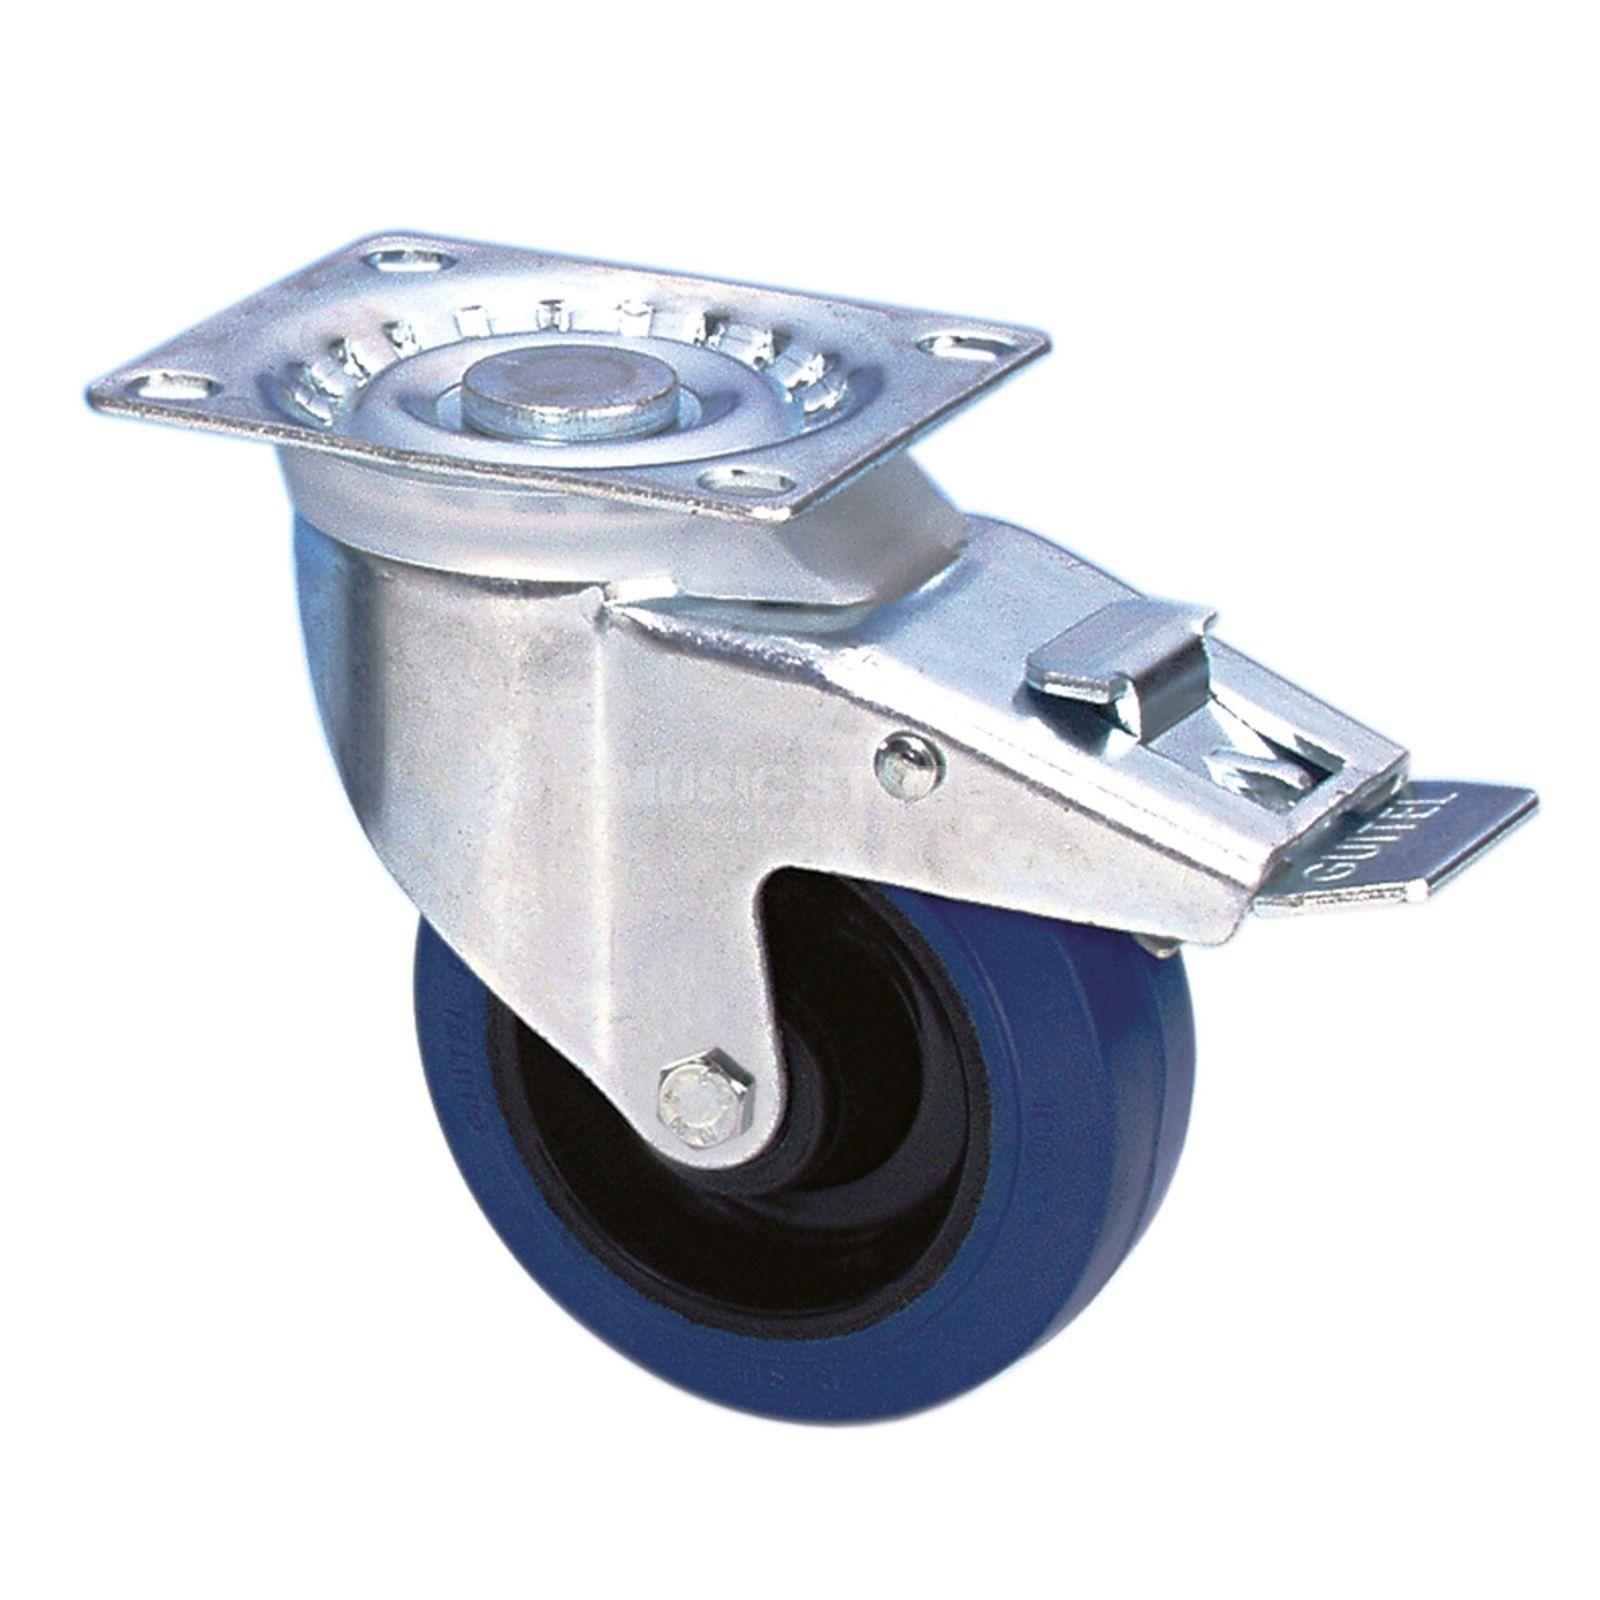 adam hall 37024 roulette pivotante 100mm bleu avec frein. Black Bedroom Furniture Sets. Home Design Ideas